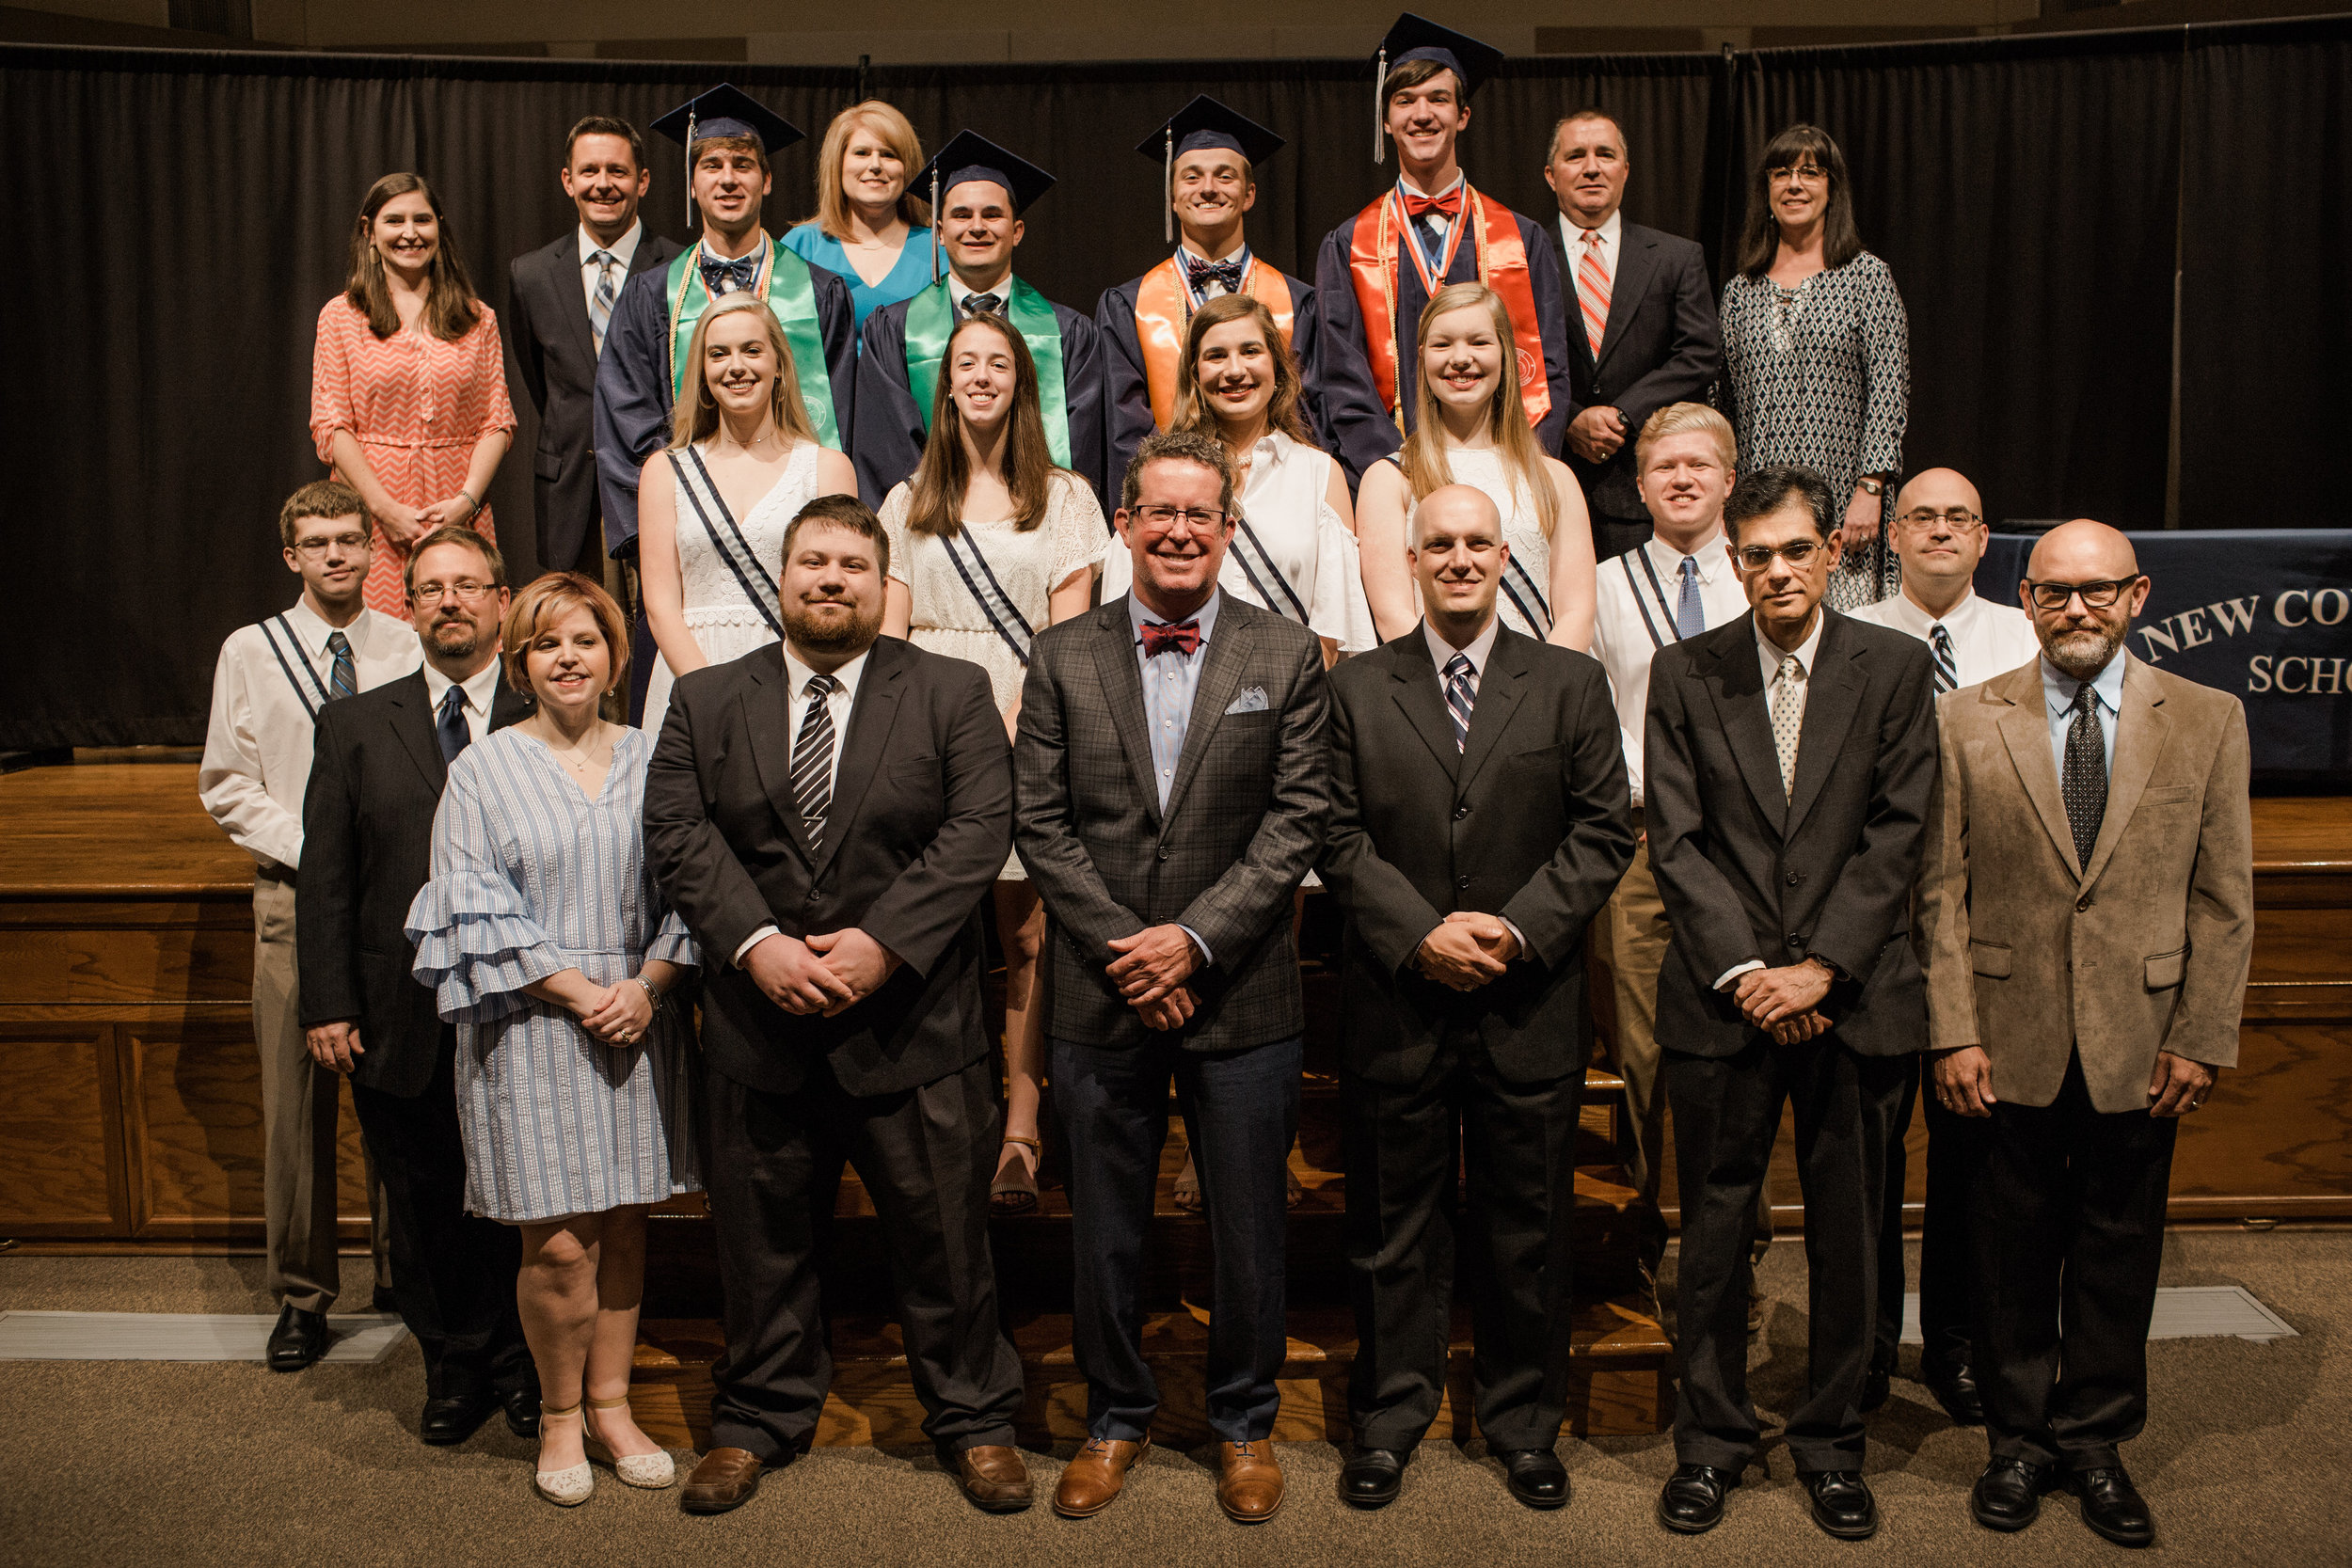 New Cov Graduation and Candids 2018 FINAL-New Cov Graduation and Candi-0290.jpg